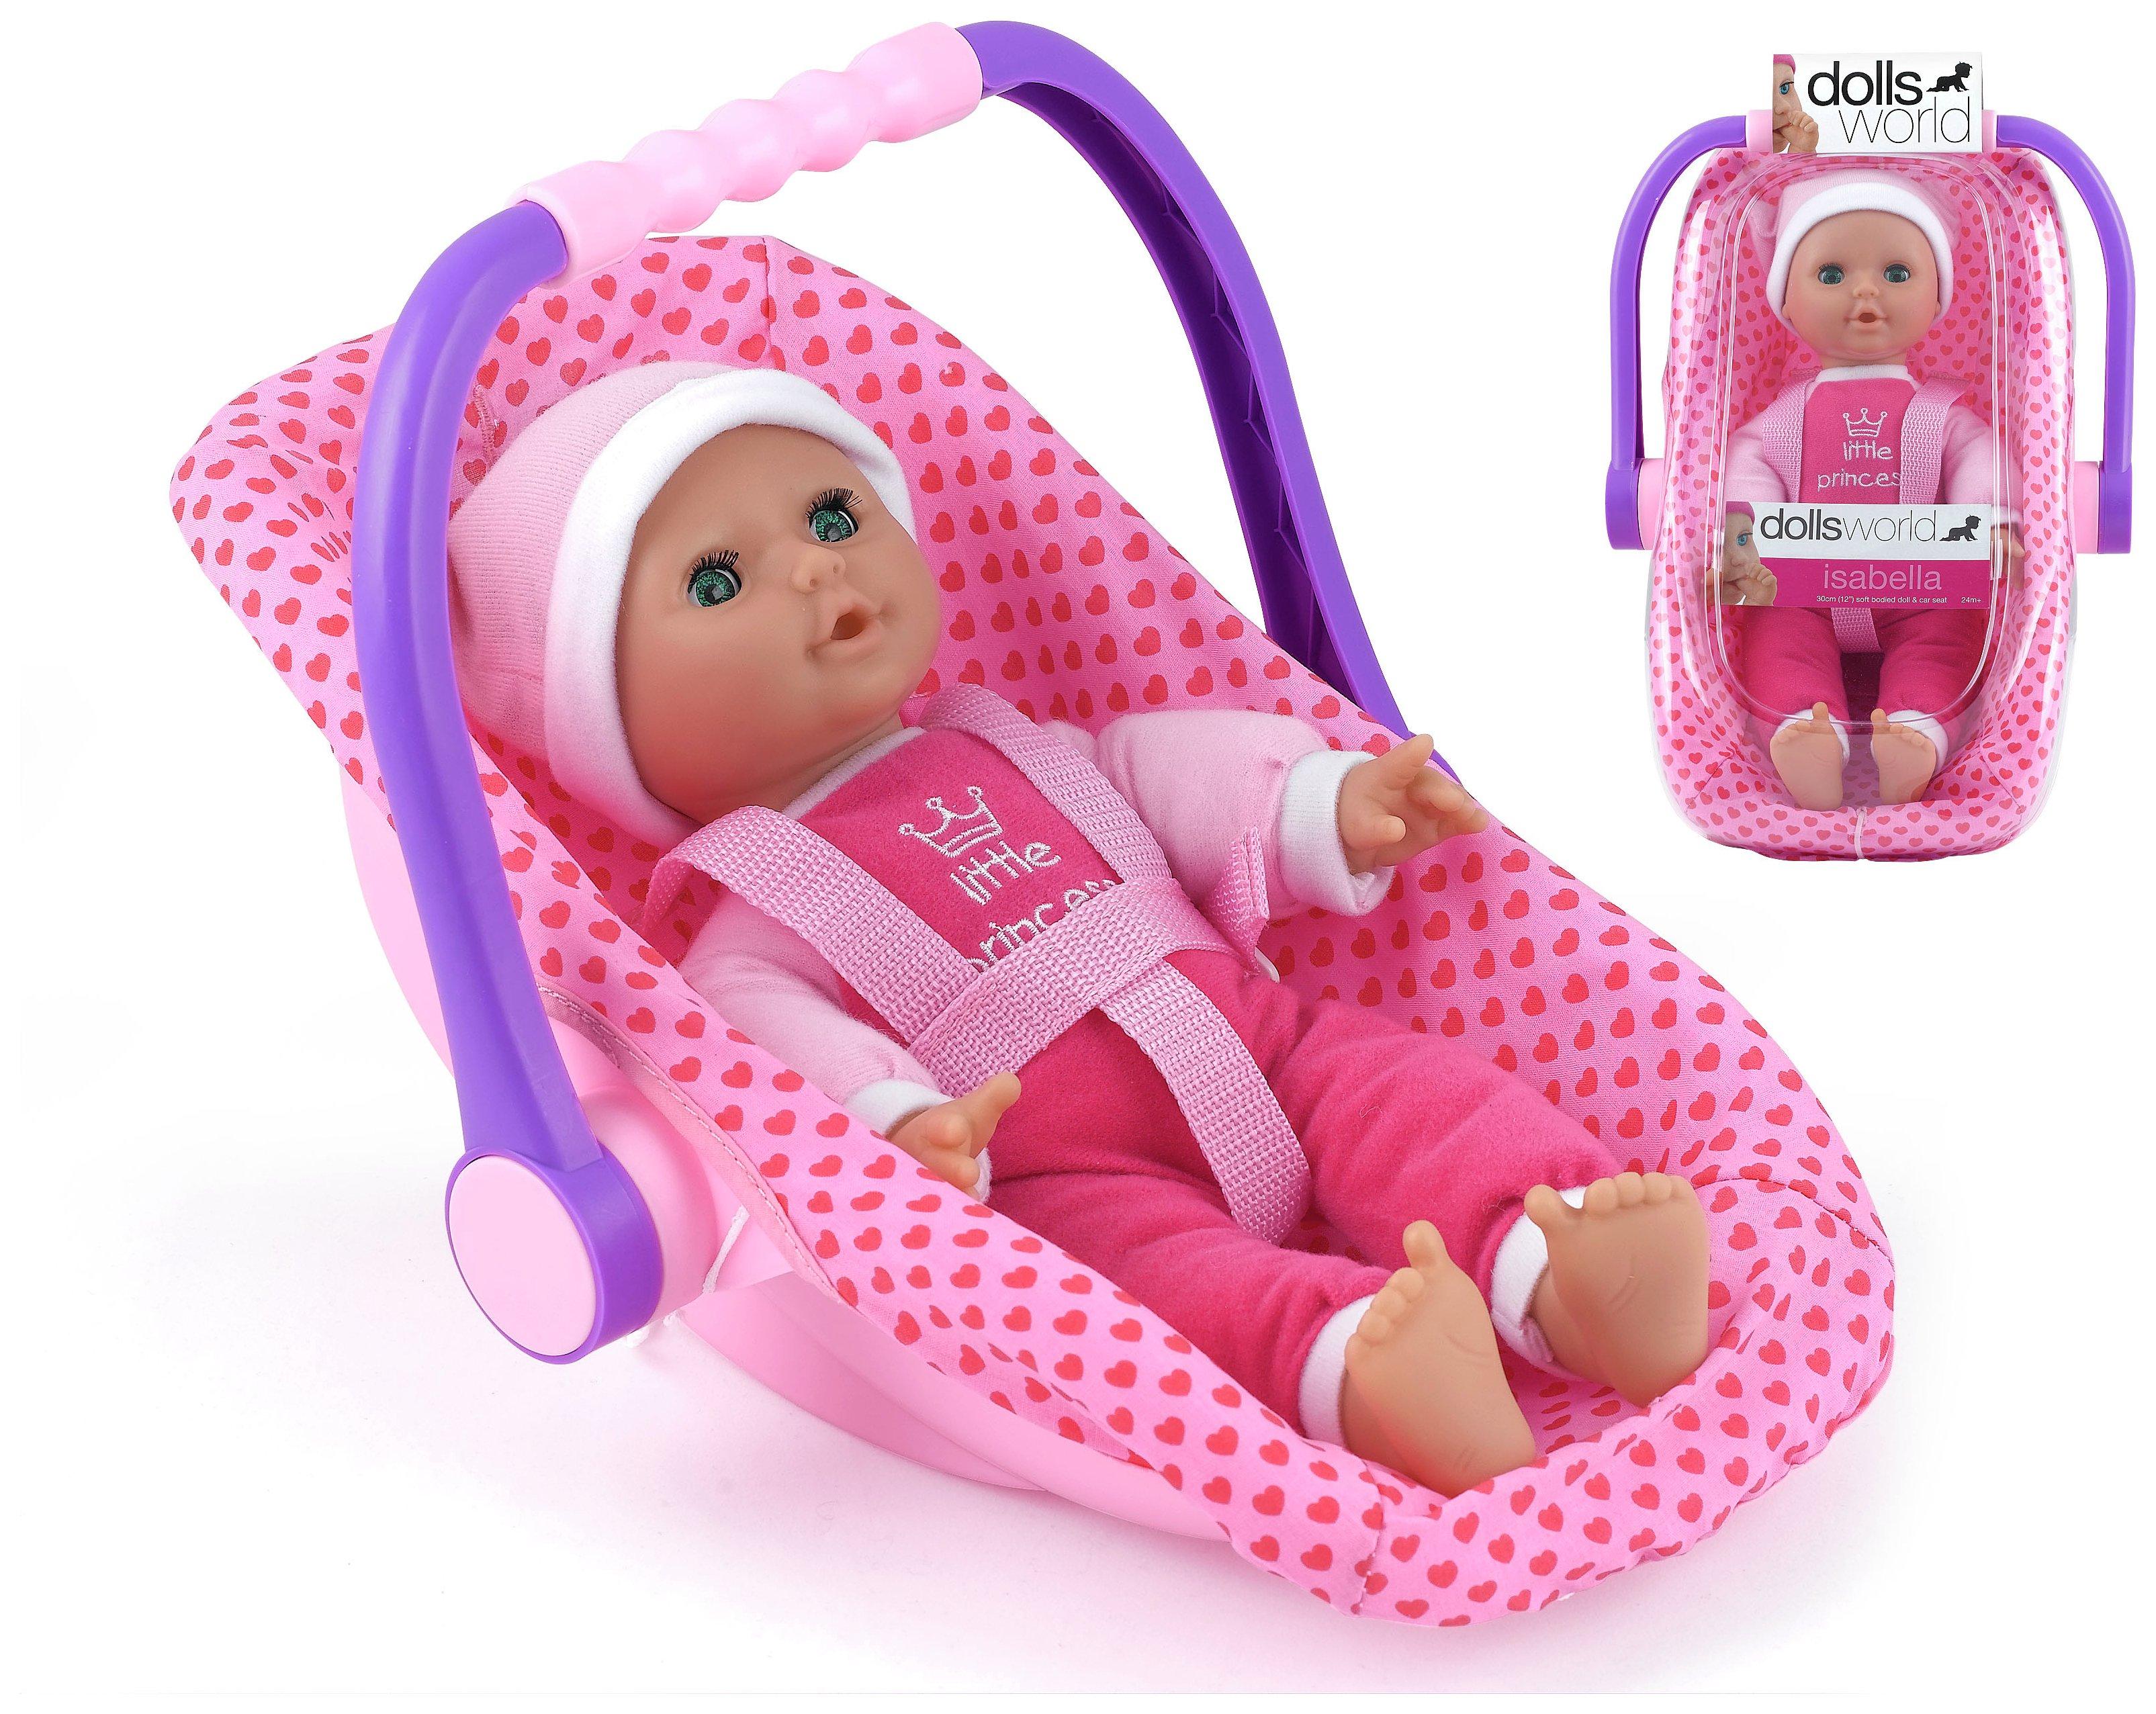 Dollsworld Isabella Doll Rock Car Seat. review